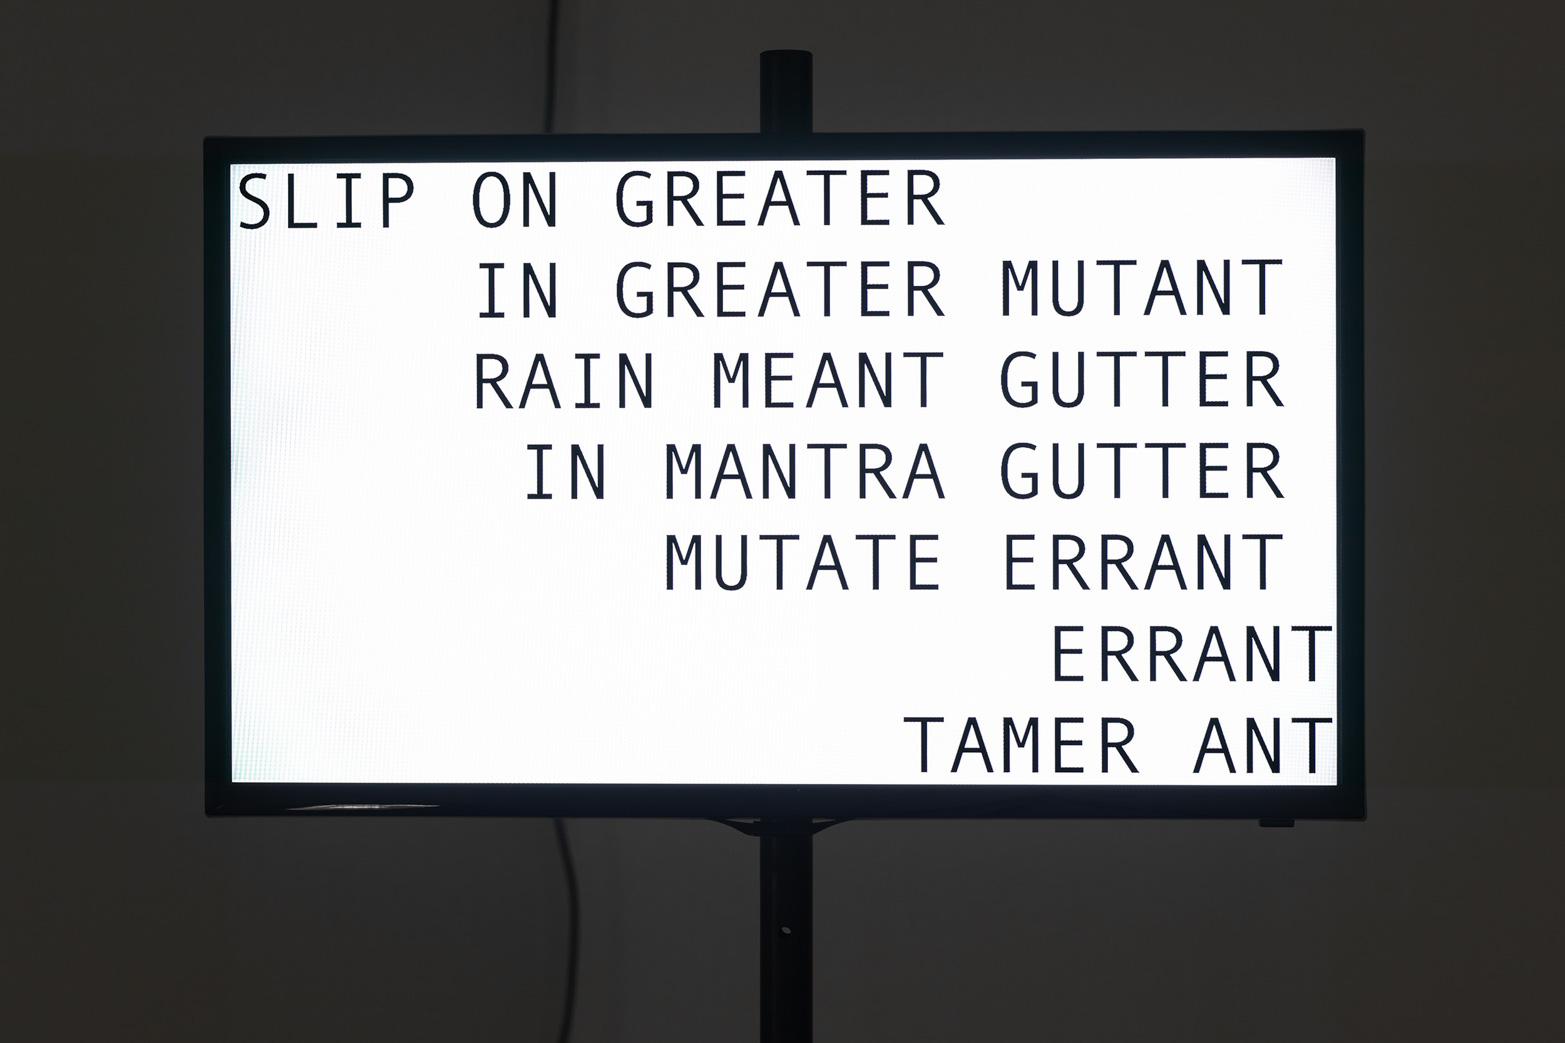 Anna Barham, Argent Minotaur Slept, 2012. Courtesy of Tenderpixel, and Arcade, London.